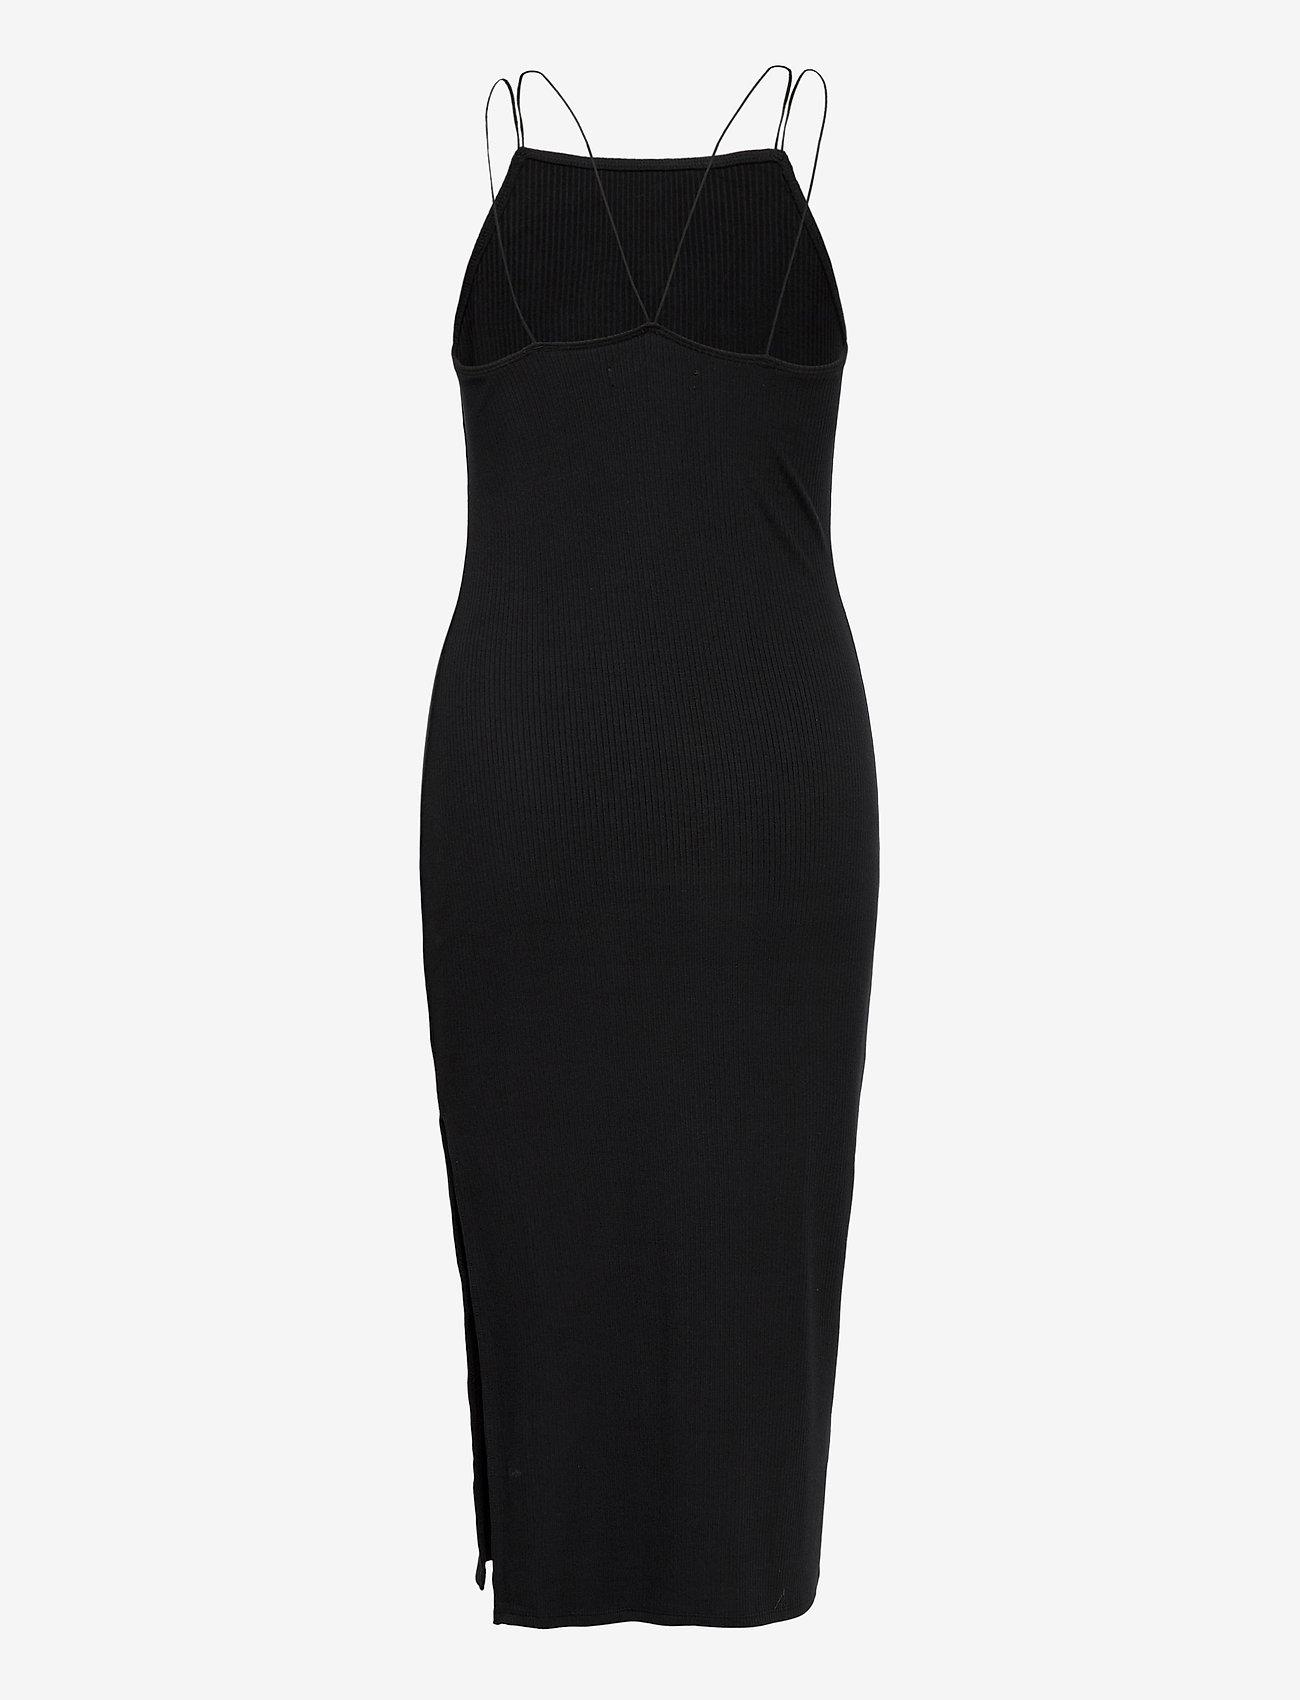 Knit Midi Dress (Black Dd) (519.35 kr) - Abercrombie & Fitch